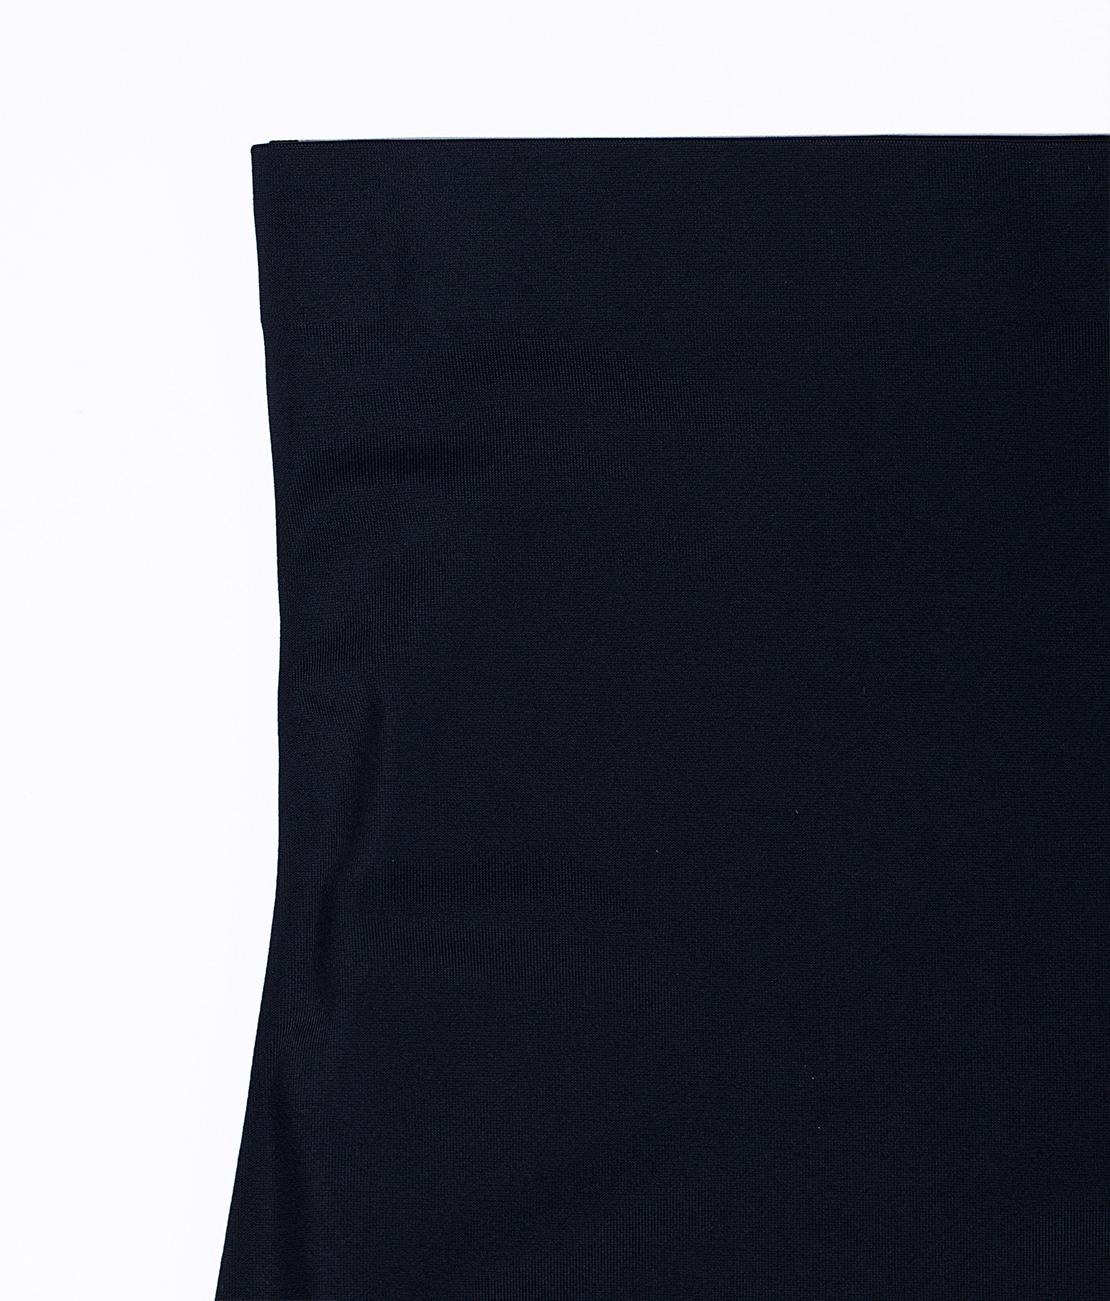 Fond de Robe Noir Packshot Detail 1